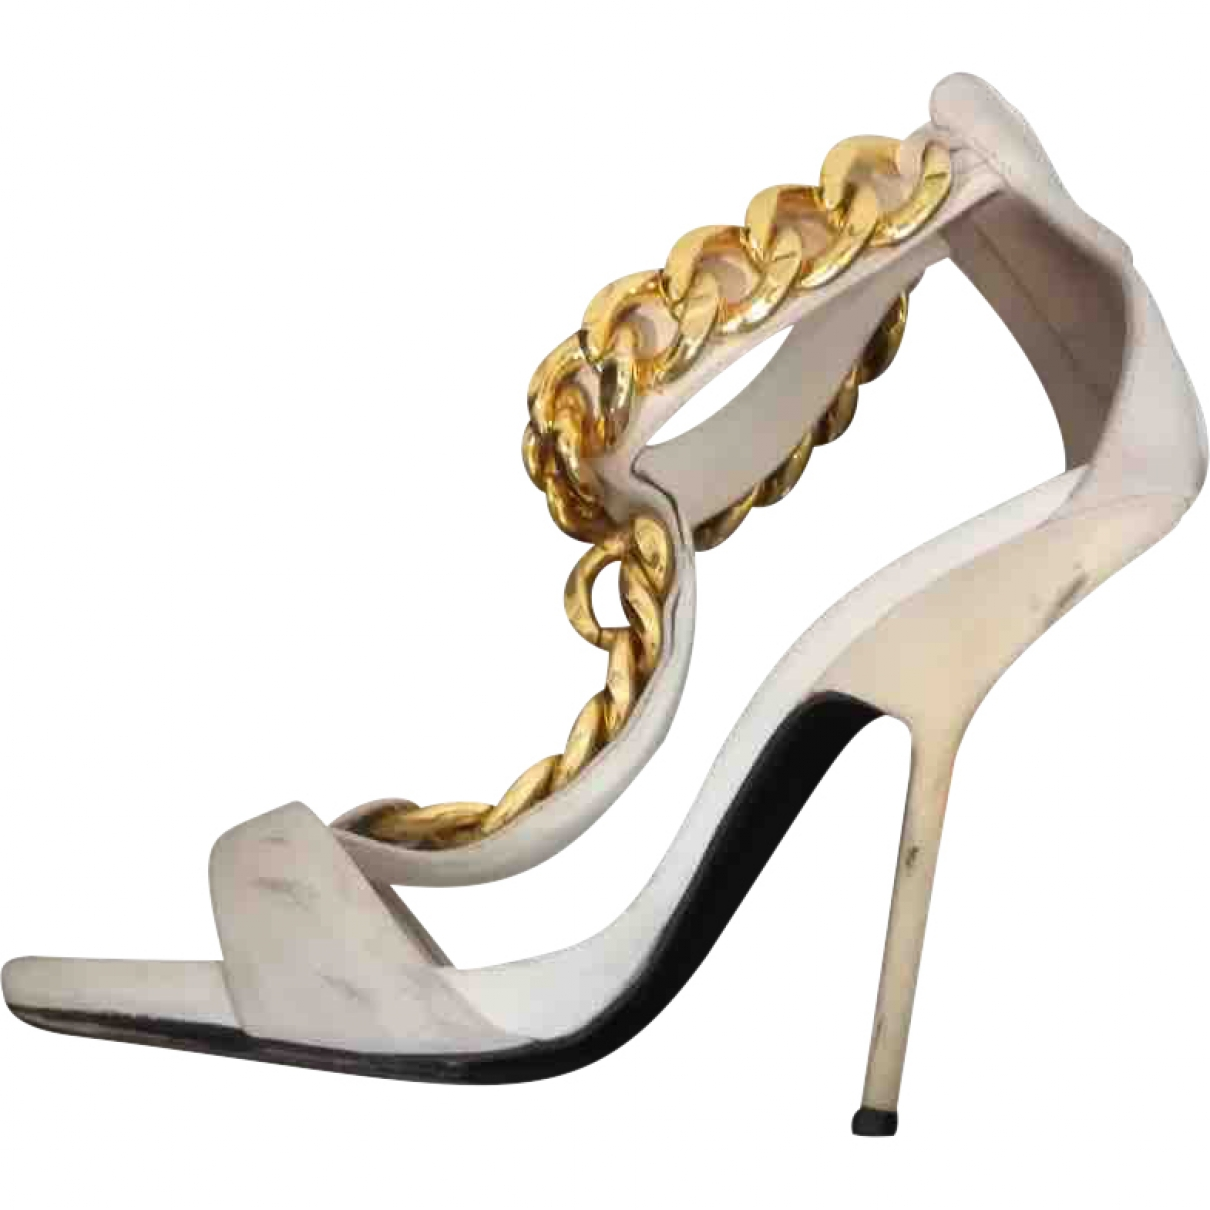 Giuseppe Zanotti \N White Leather Sandals for Women 40 EU